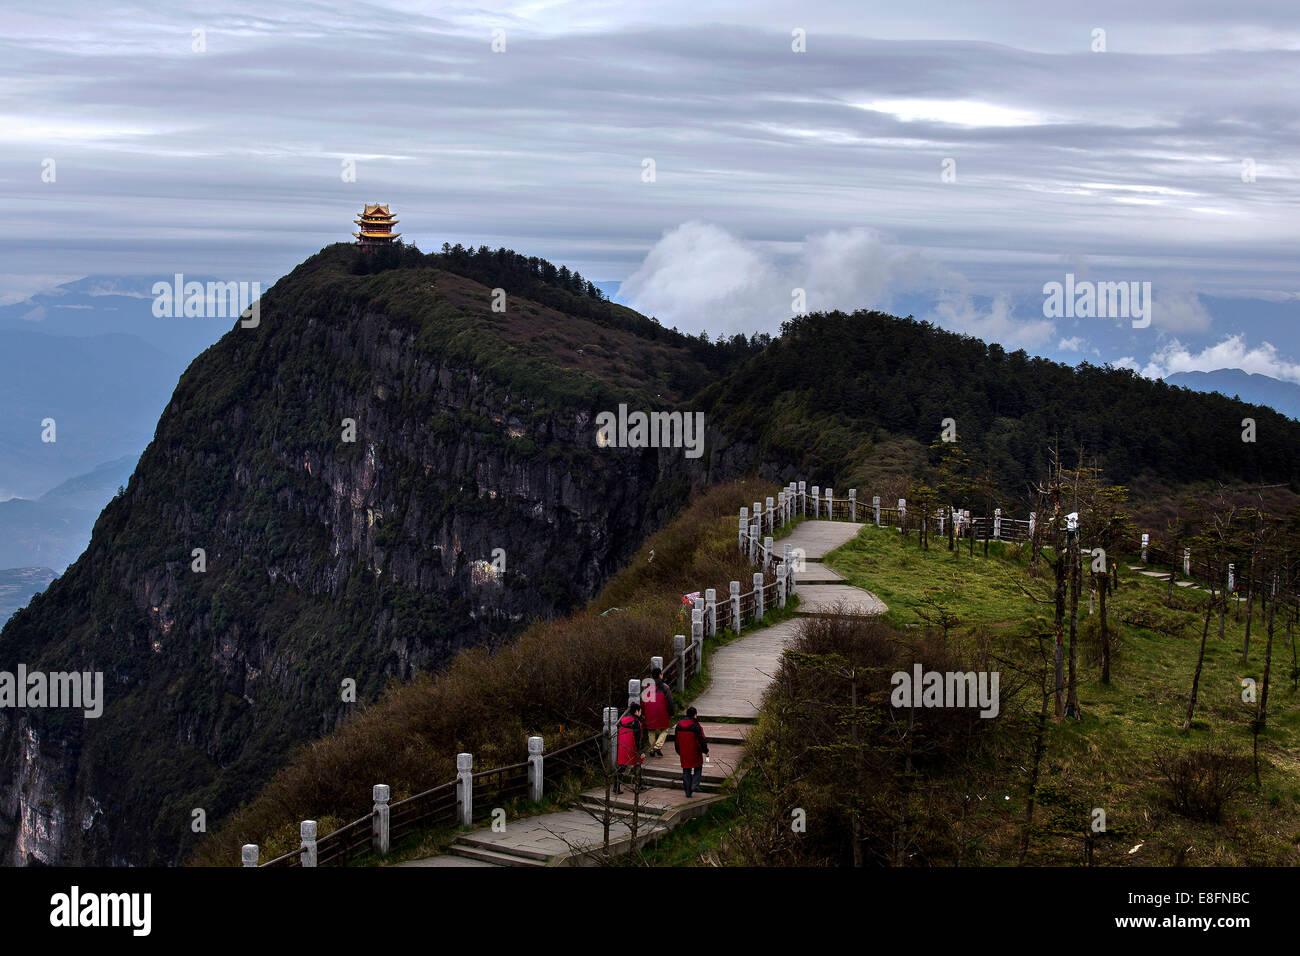 Wanfo Peak, Leshan City, Emei Shan, China Wanfo Peak And Its Solitary Temple - Stock Image